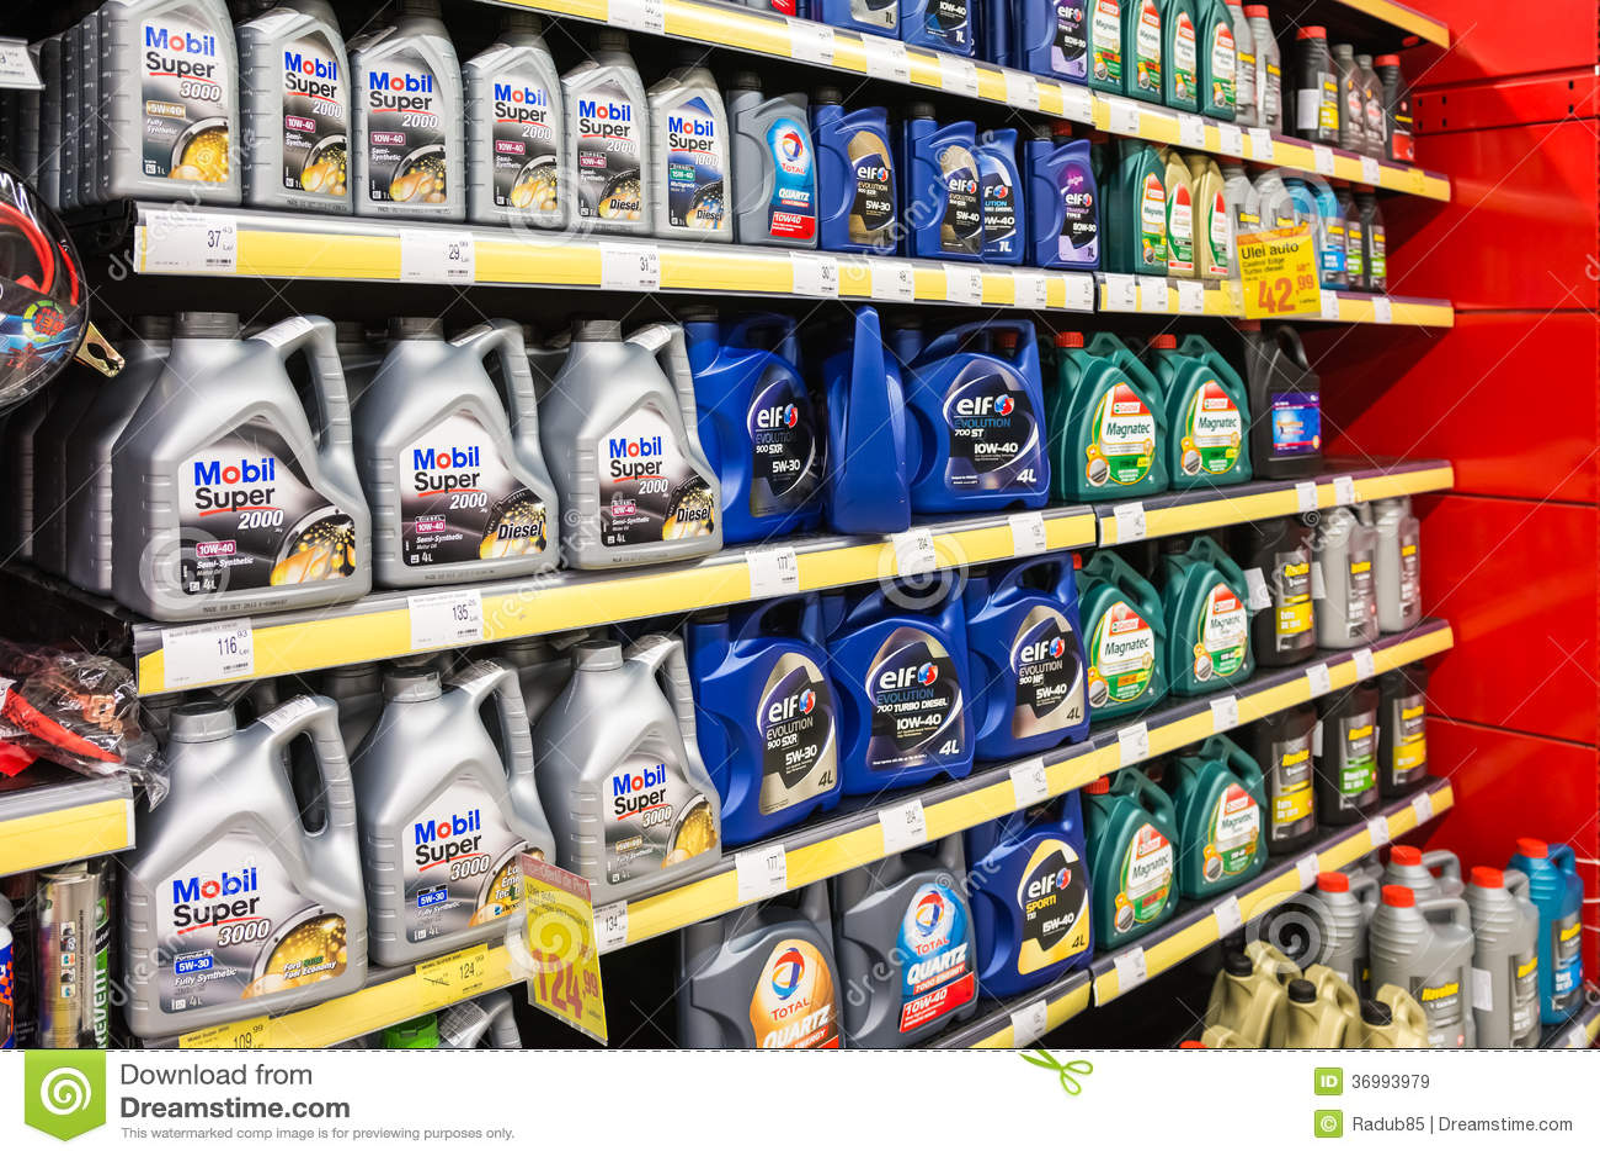 automobile motor oil on supermarket shelf editorial stock